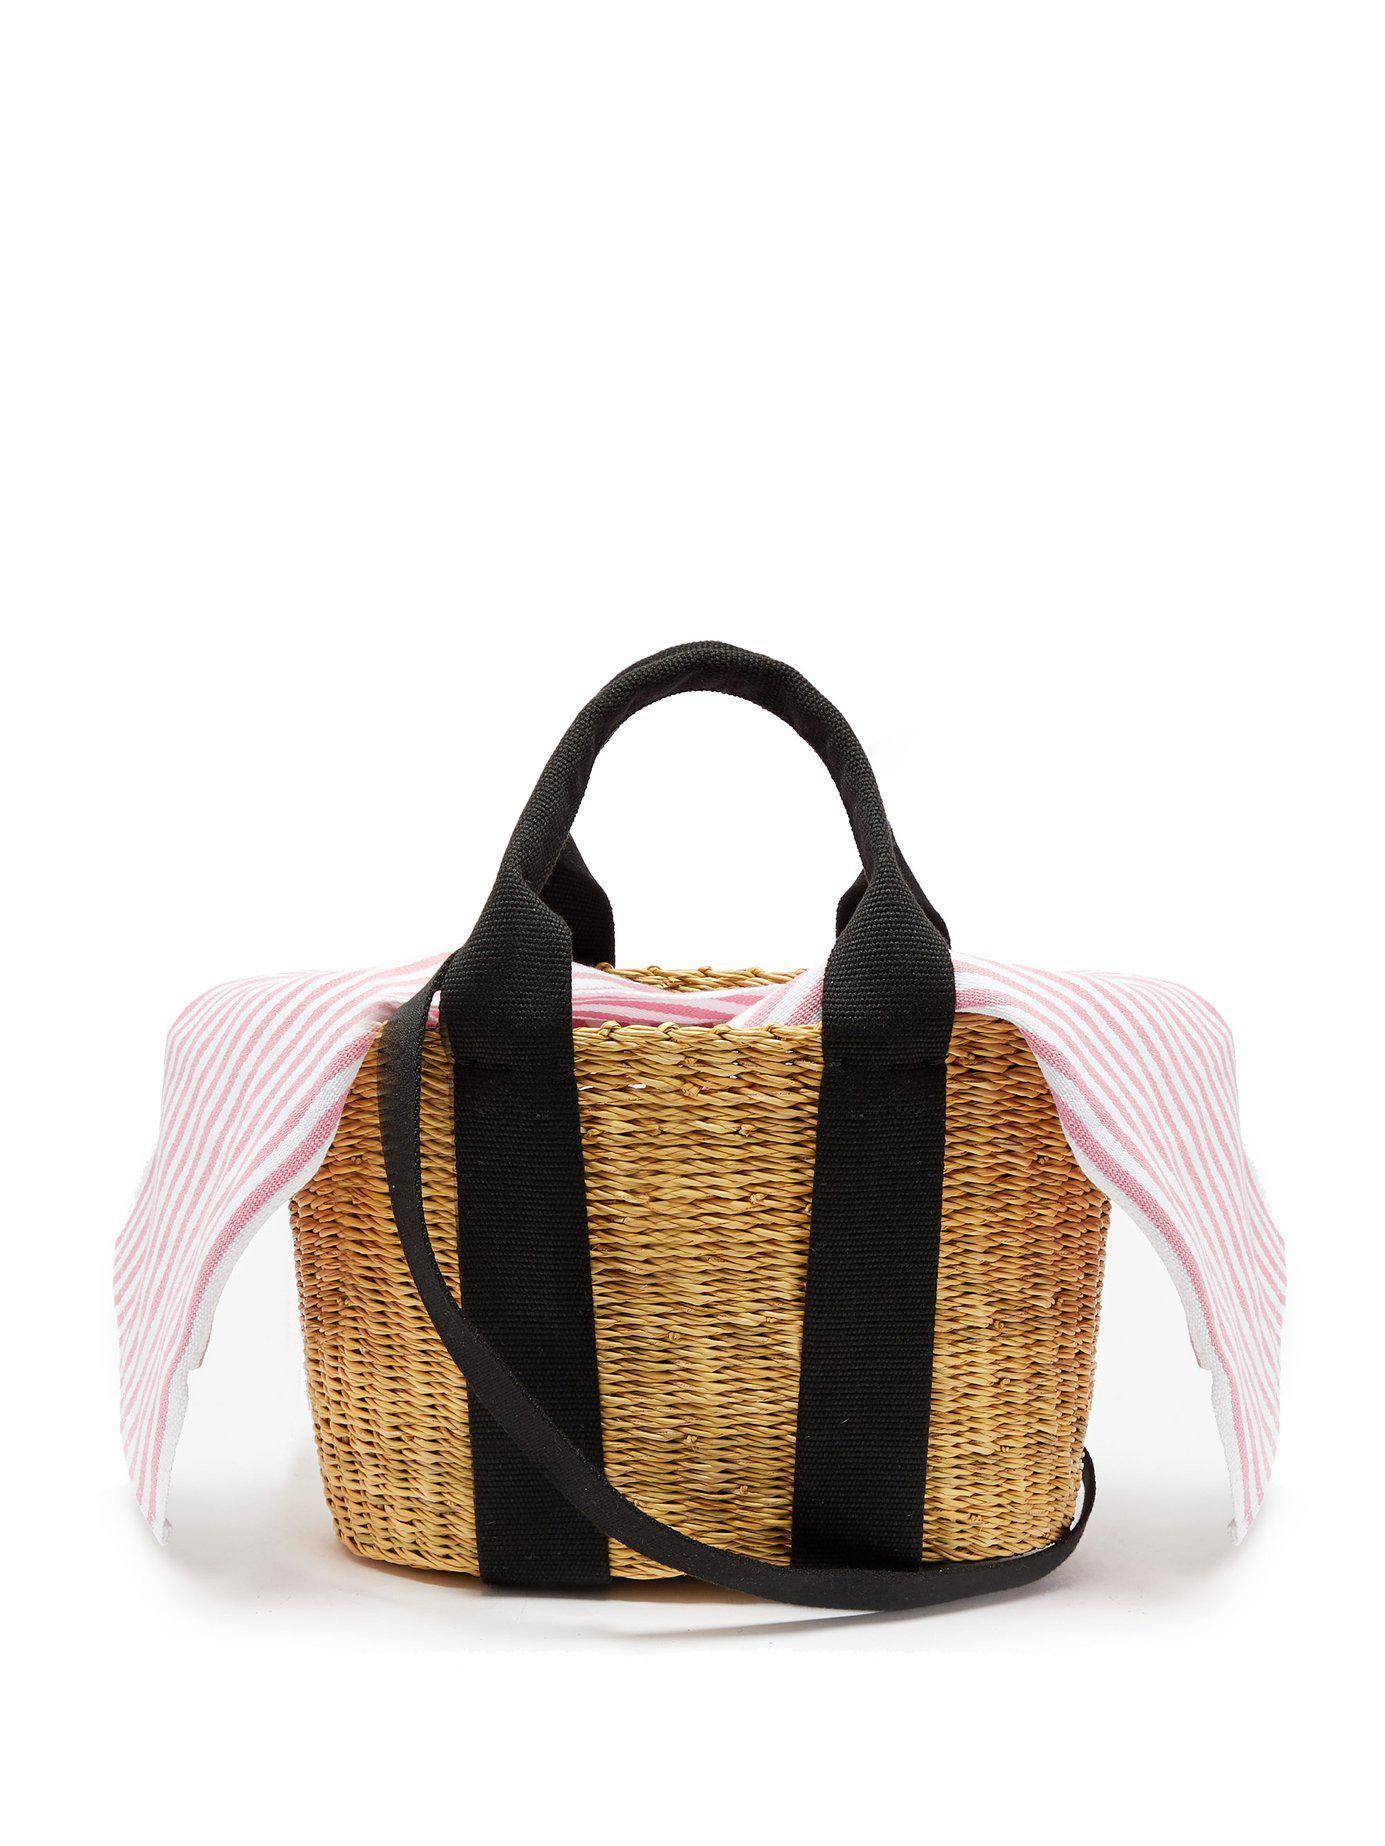 8d5690c2a600 Muuñ. Women s Caba Mini Canvas And Woven Straw Bag